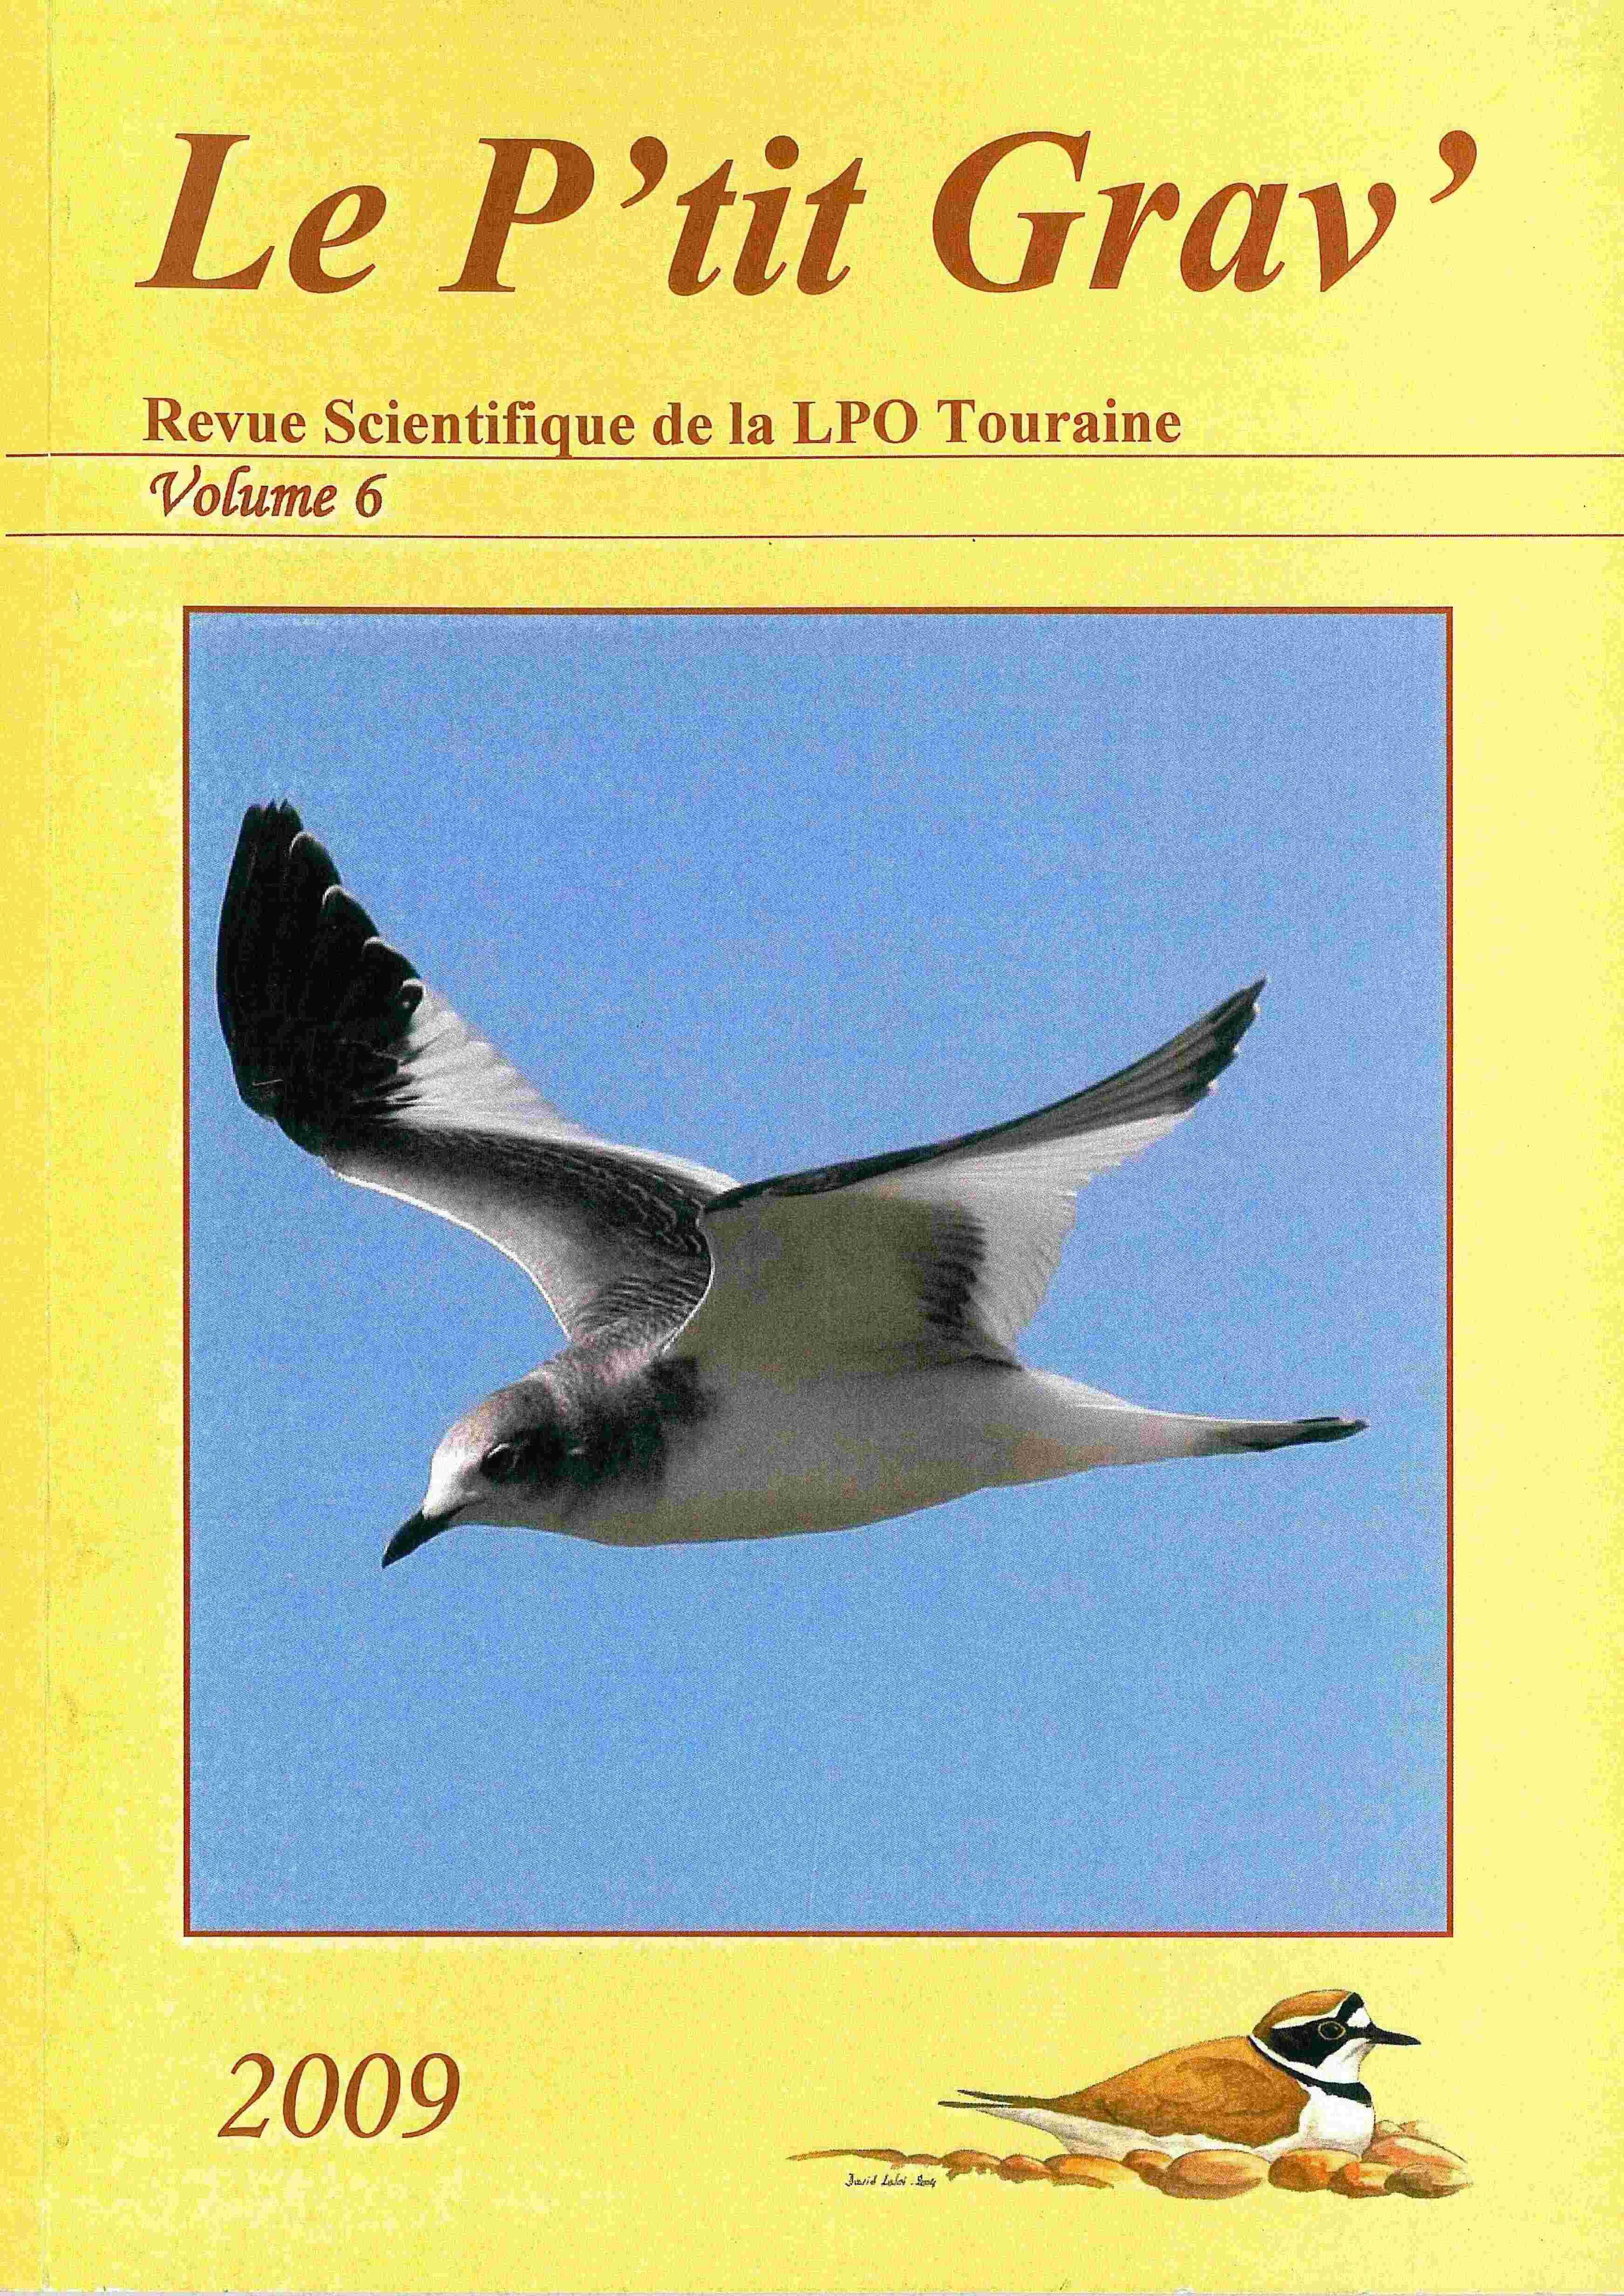 https://cdnfiles1.biolovision.net/www.faune-touraine.org/userfiles/MonDossier/PtitGravvol6.jpg